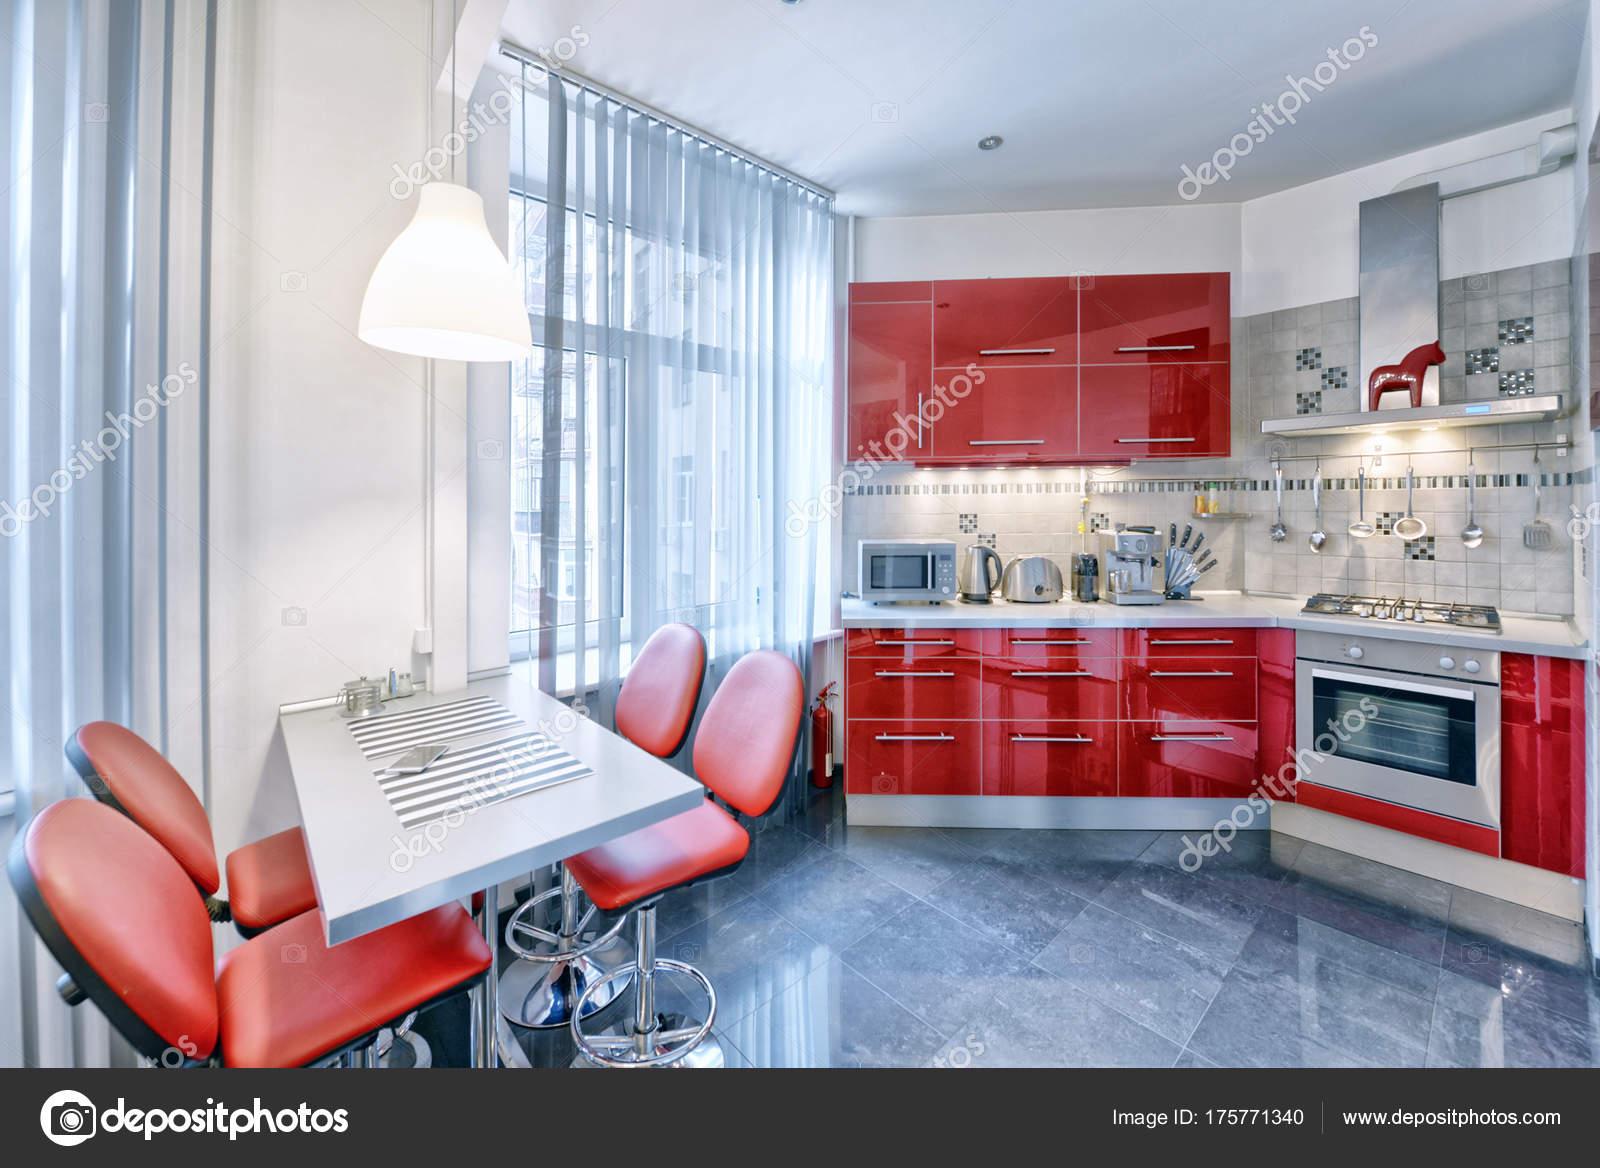 Küche Interieur Roter Farbe Modernes Haus — Stockfoto ...